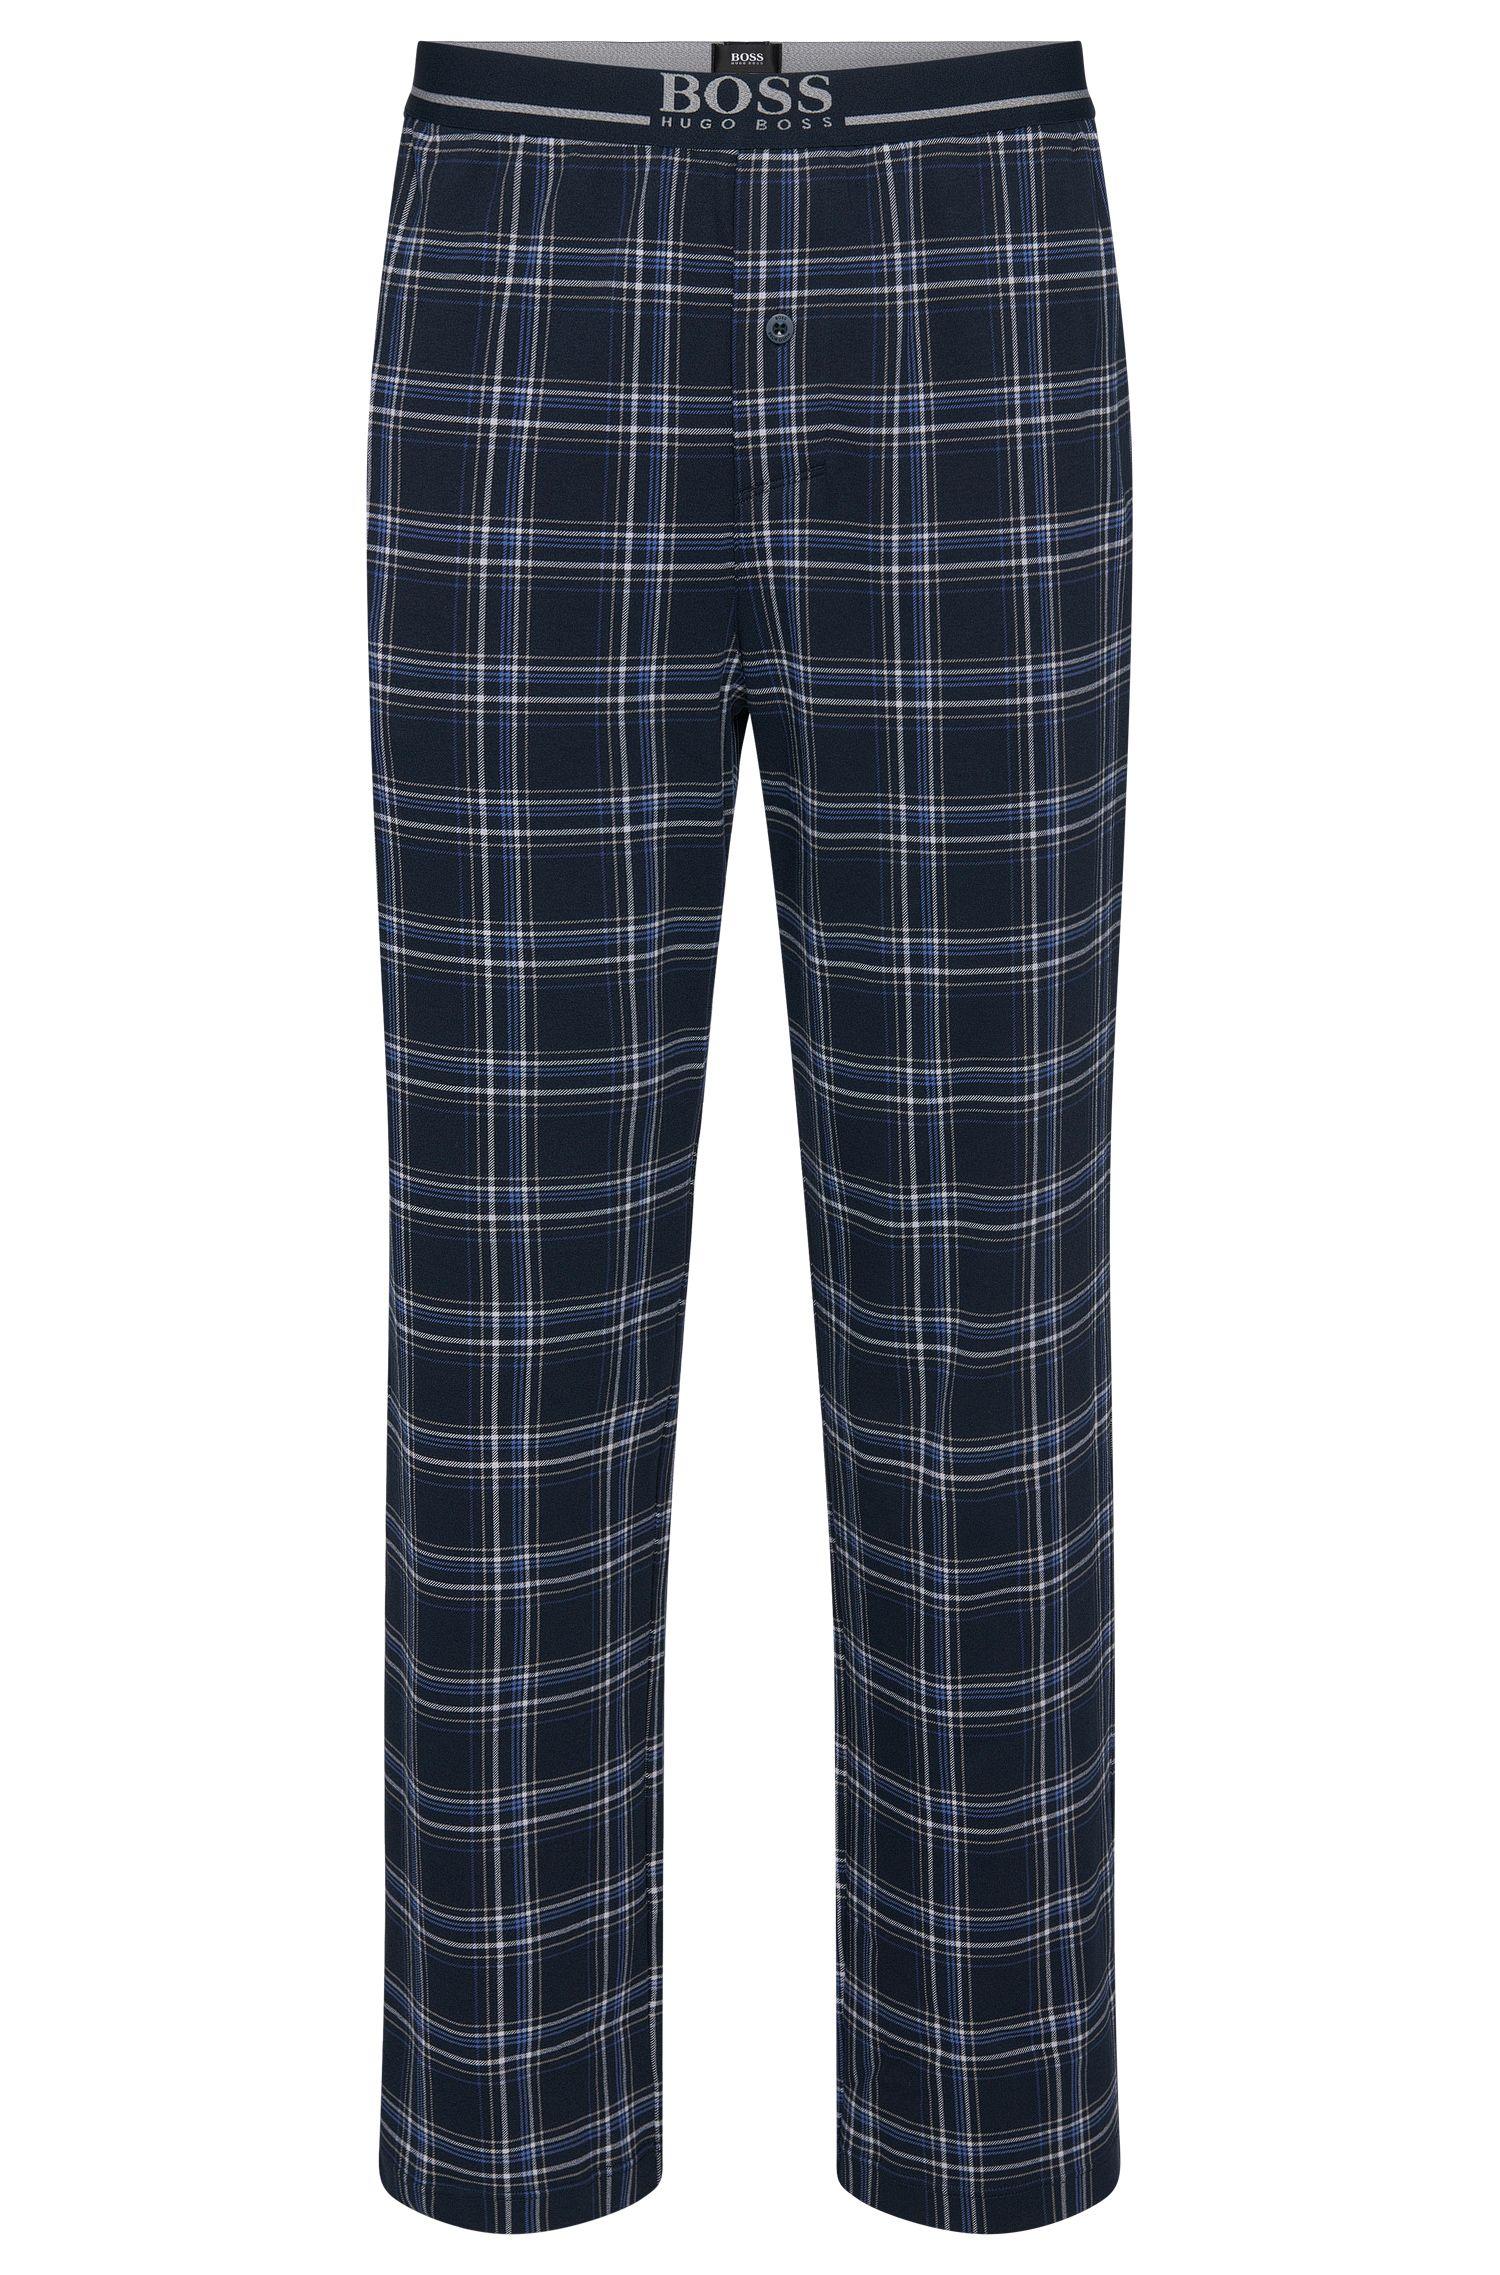 Karierte Pyjama-Hose aus elastischer Baumwolle: 'Long Pant EW'